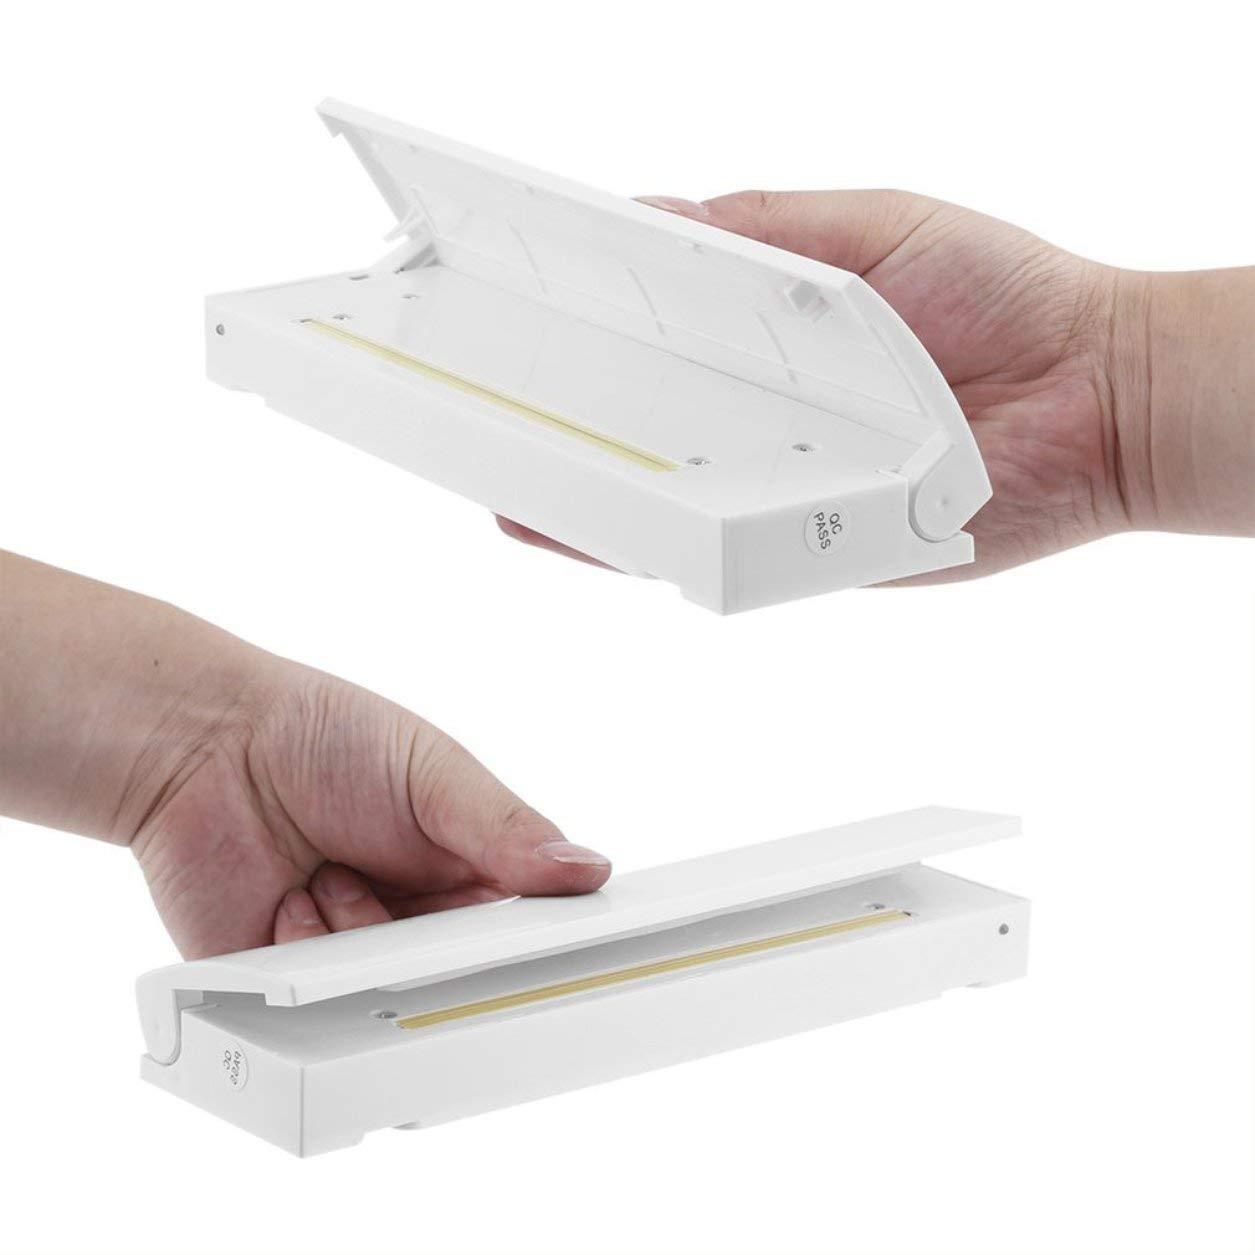 Dailyinshop Sigillante portatile per alimenti elettrico